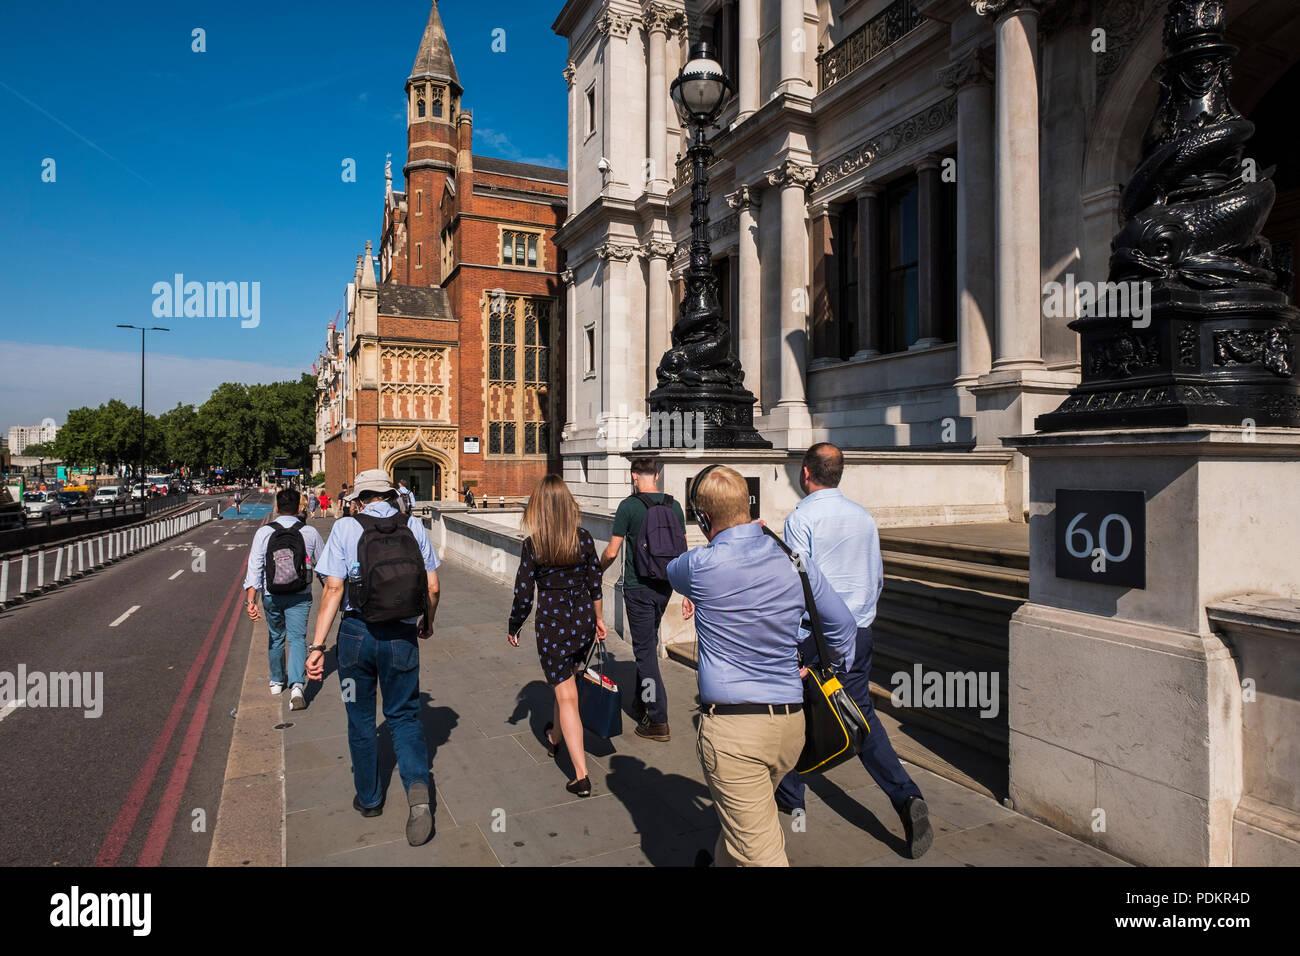 J P Morgan 60 Victoria Embankment London England U K Stock Photo Alamy